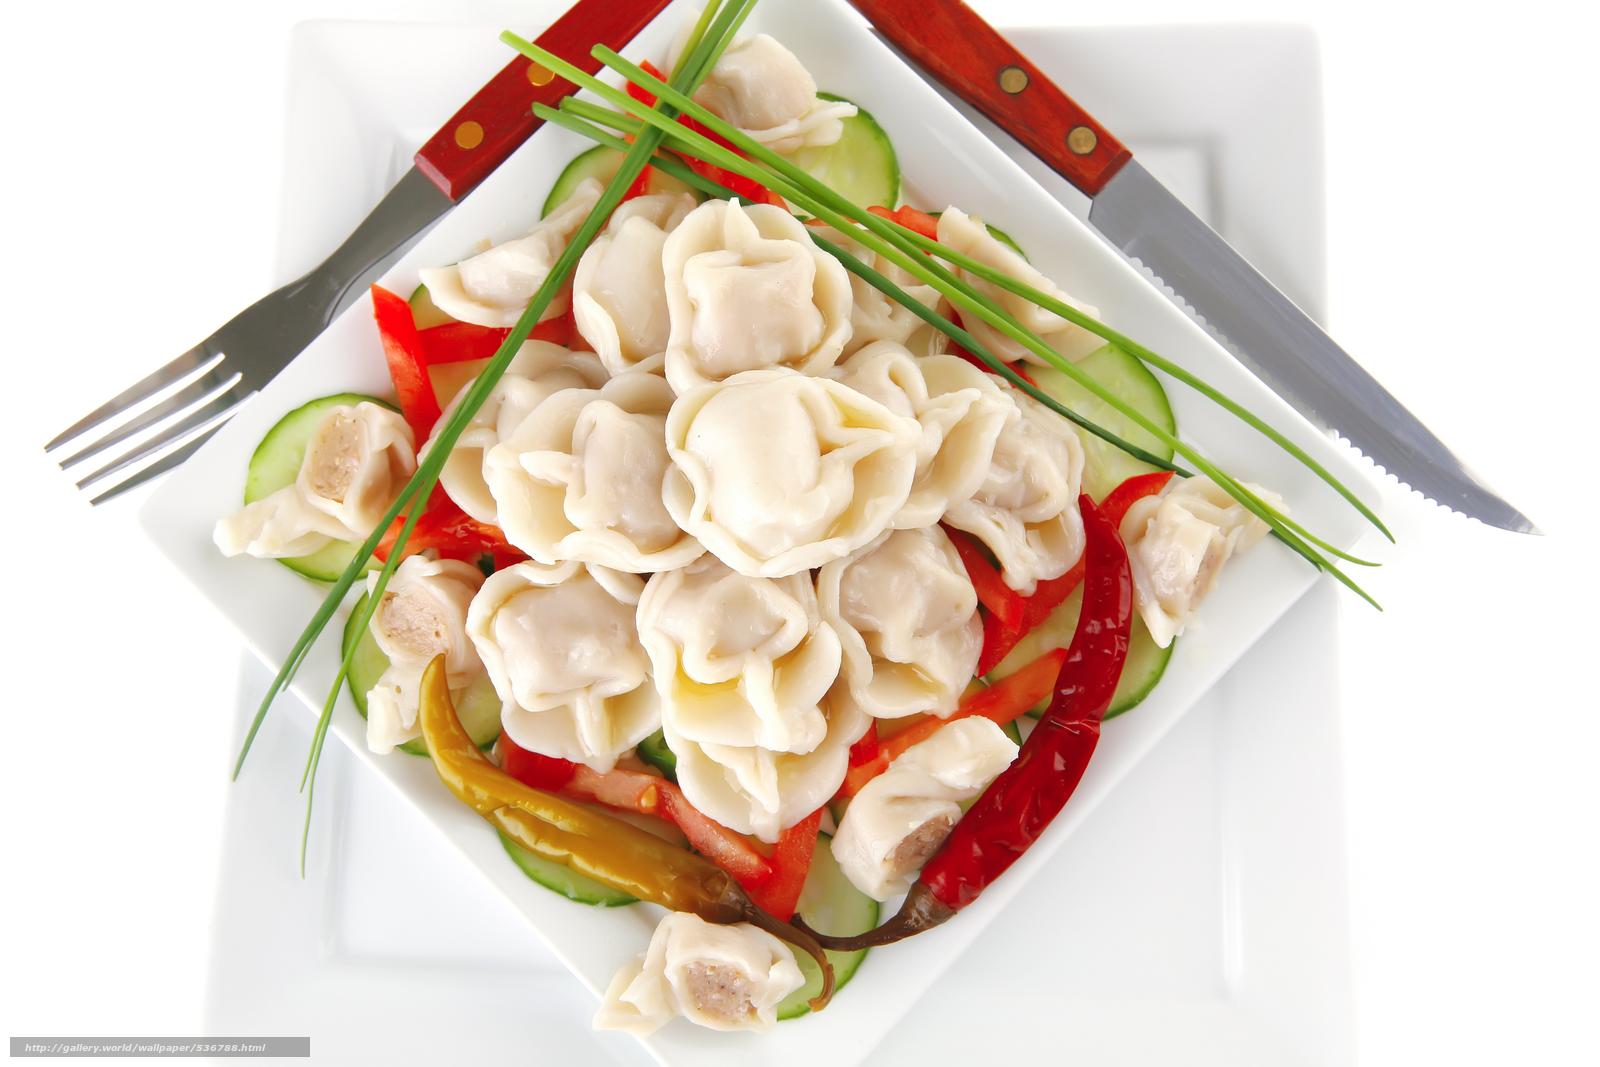 Download wallpaper pelmeni,  vegetables,  food free desktop wallpaper in the resolution 8736x5824 — picture №536788